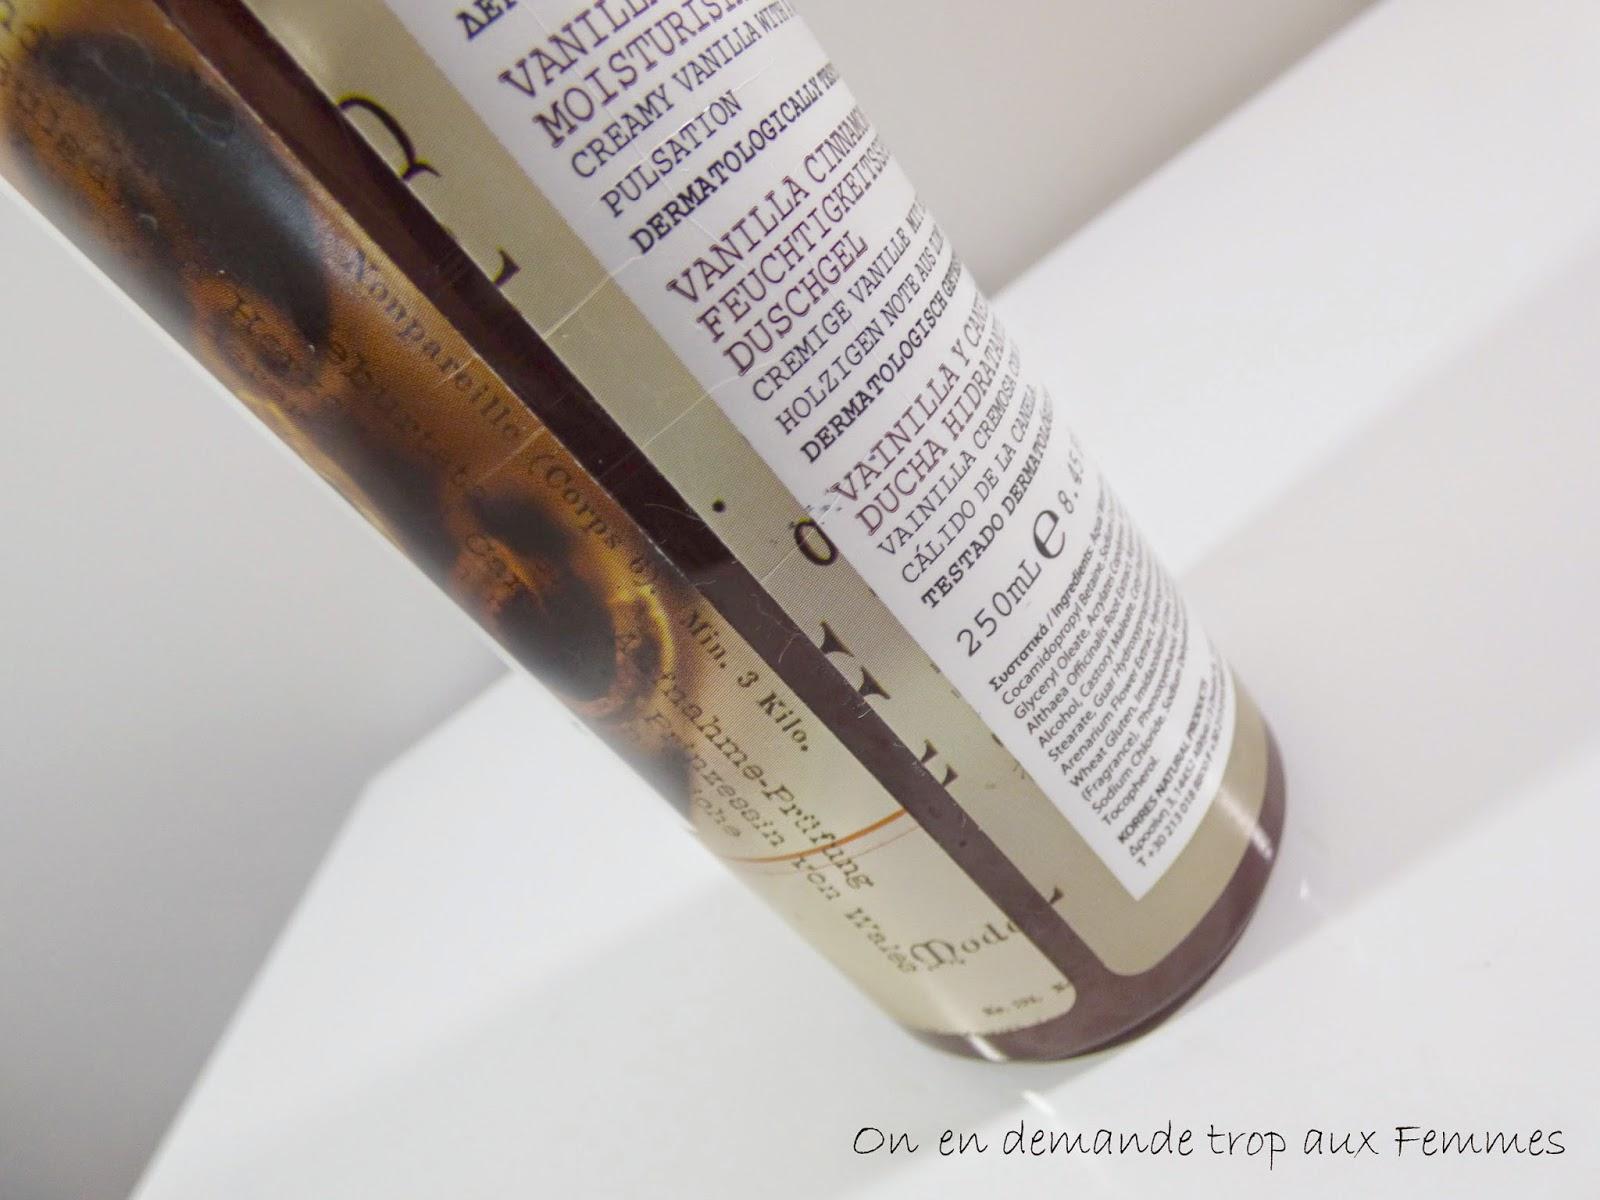 gel douche korres vanille cannelle